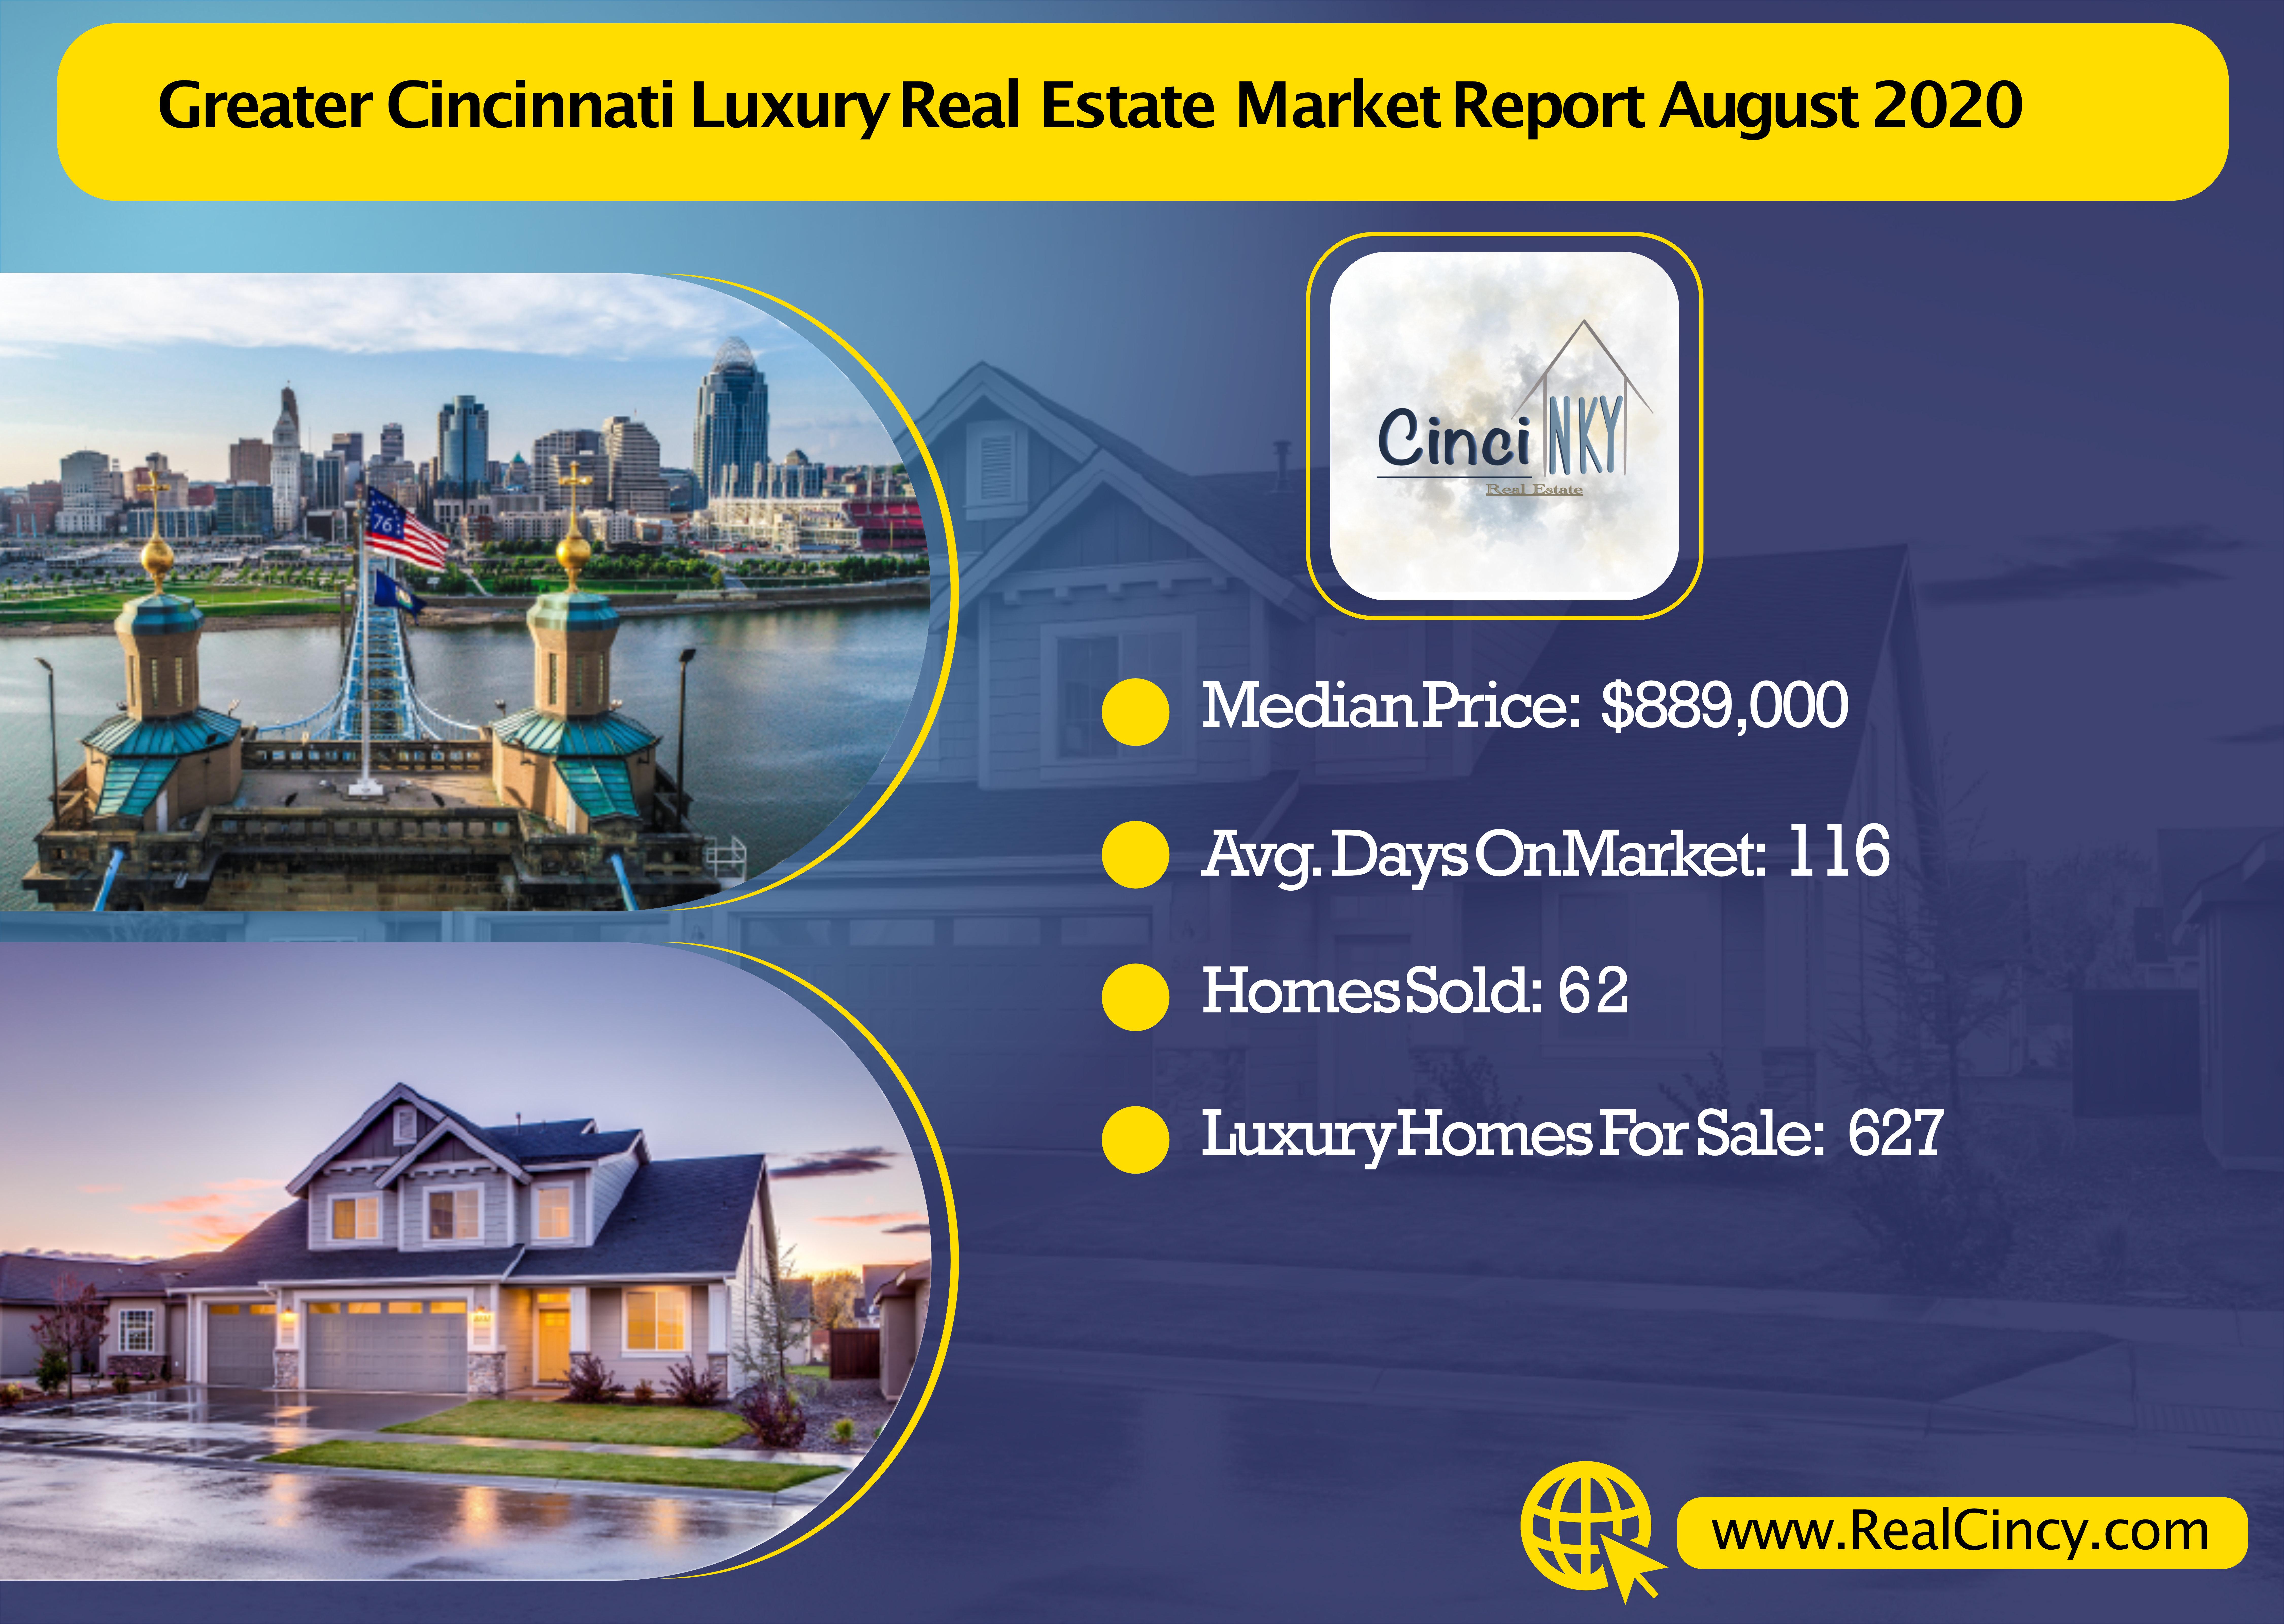 August 2020 Greater Cincinnati Luxury Real Estate Market Report